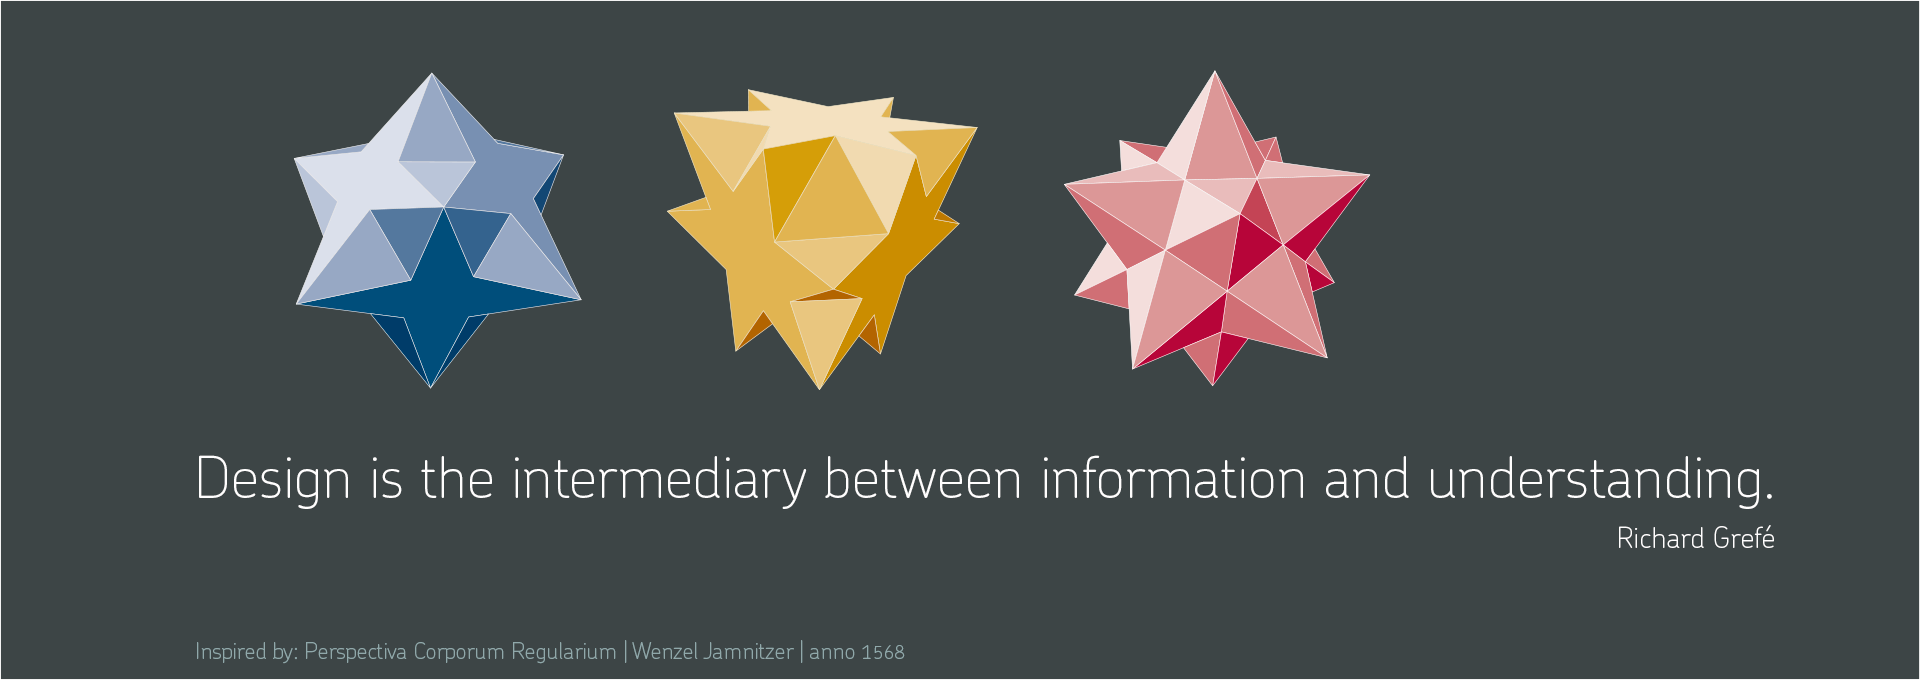 Design is the intermediary between information and understanding. Richard Grefé